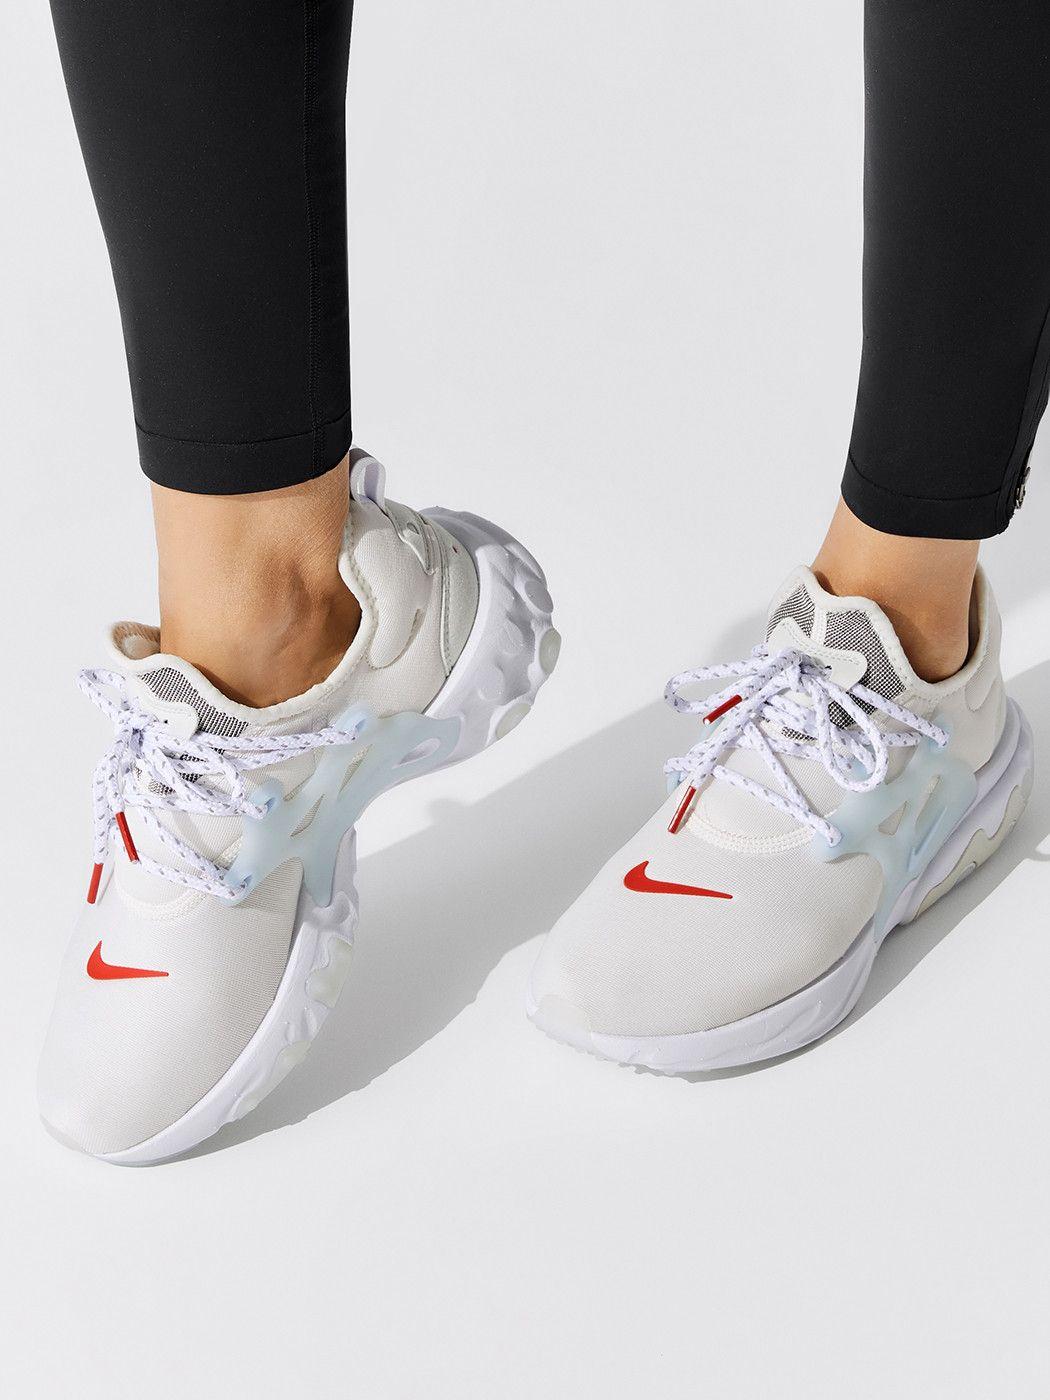 bicapa haga turismo jaula  Nike React Presto in Phantom/white-half Blue-spruce Aura | White nike  shoes, Nike shoes women, Nike presto women